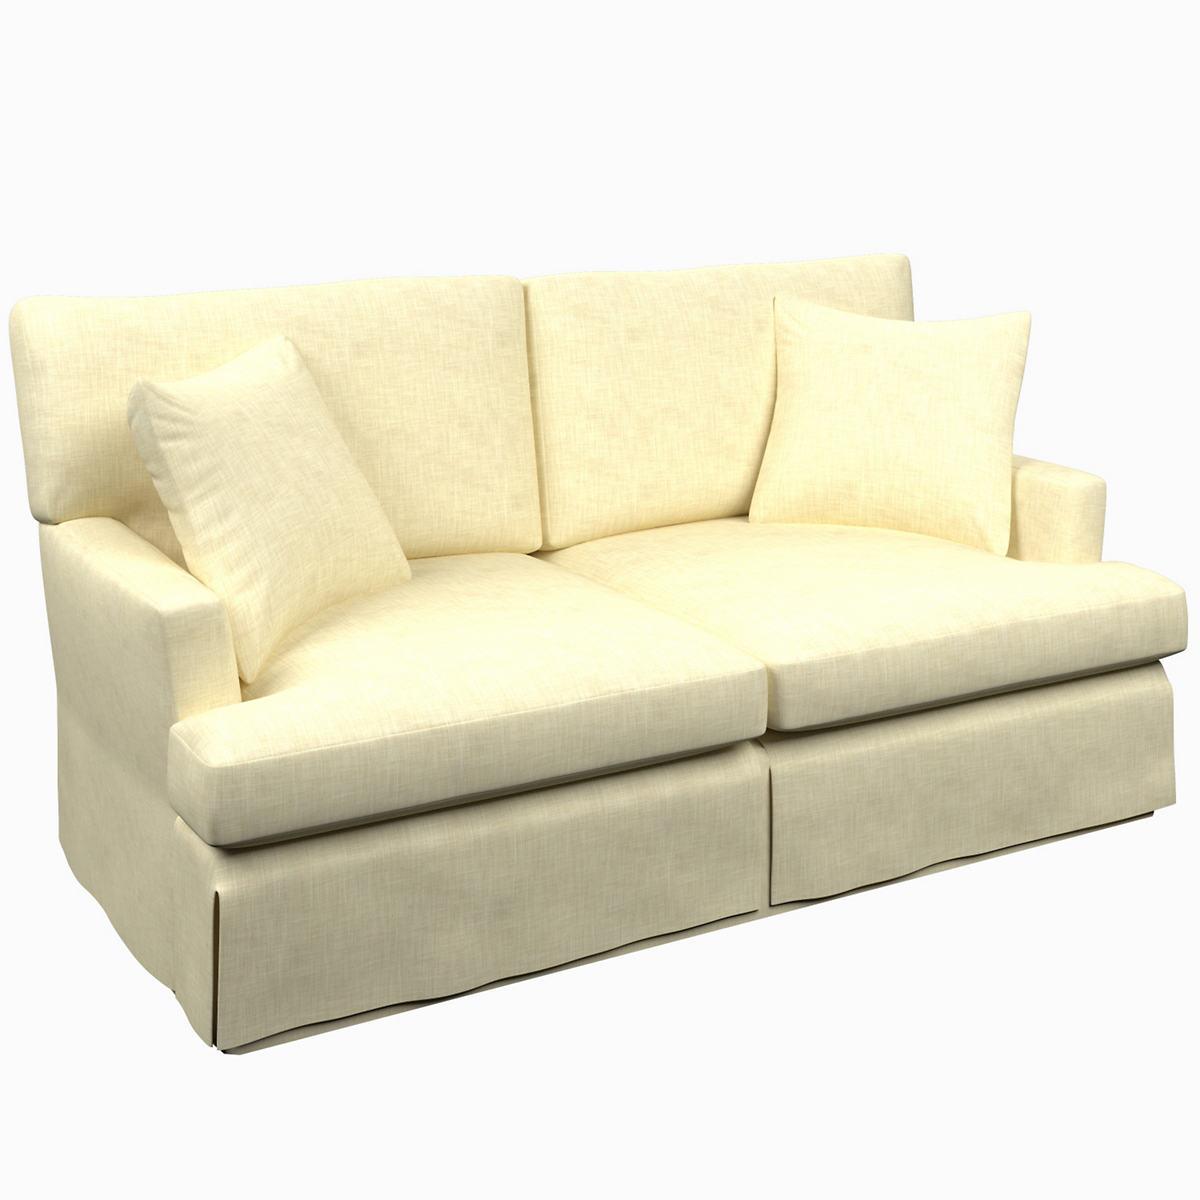 Greylock Ivory Saybrook 2 Seater Slipcovered Sofa